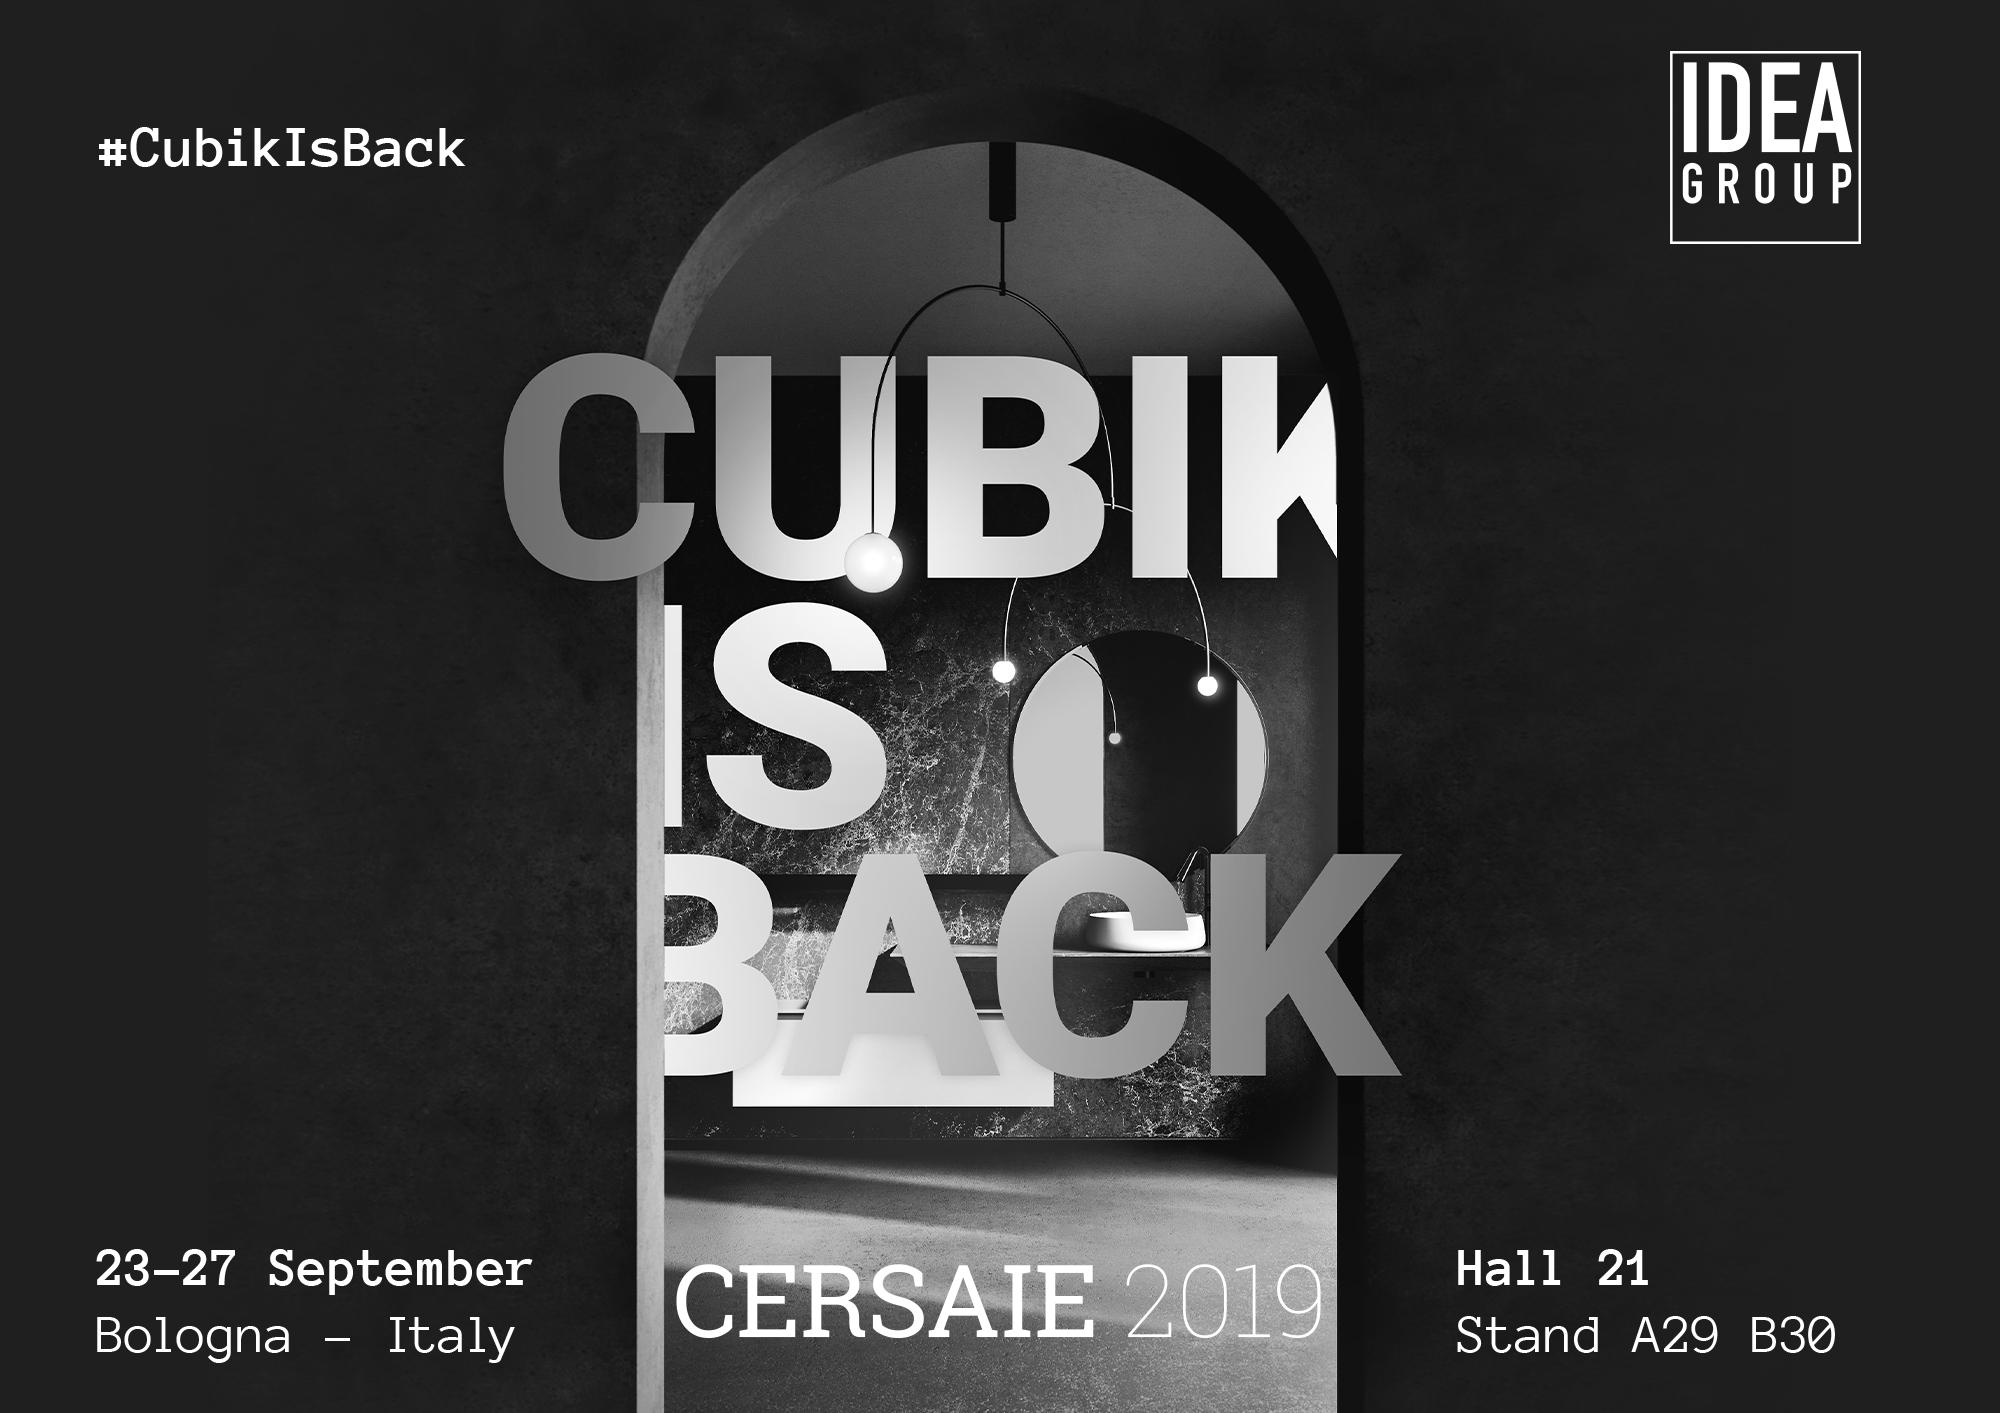 Ideagroup at Cersaie 2019: #CubikIsBack